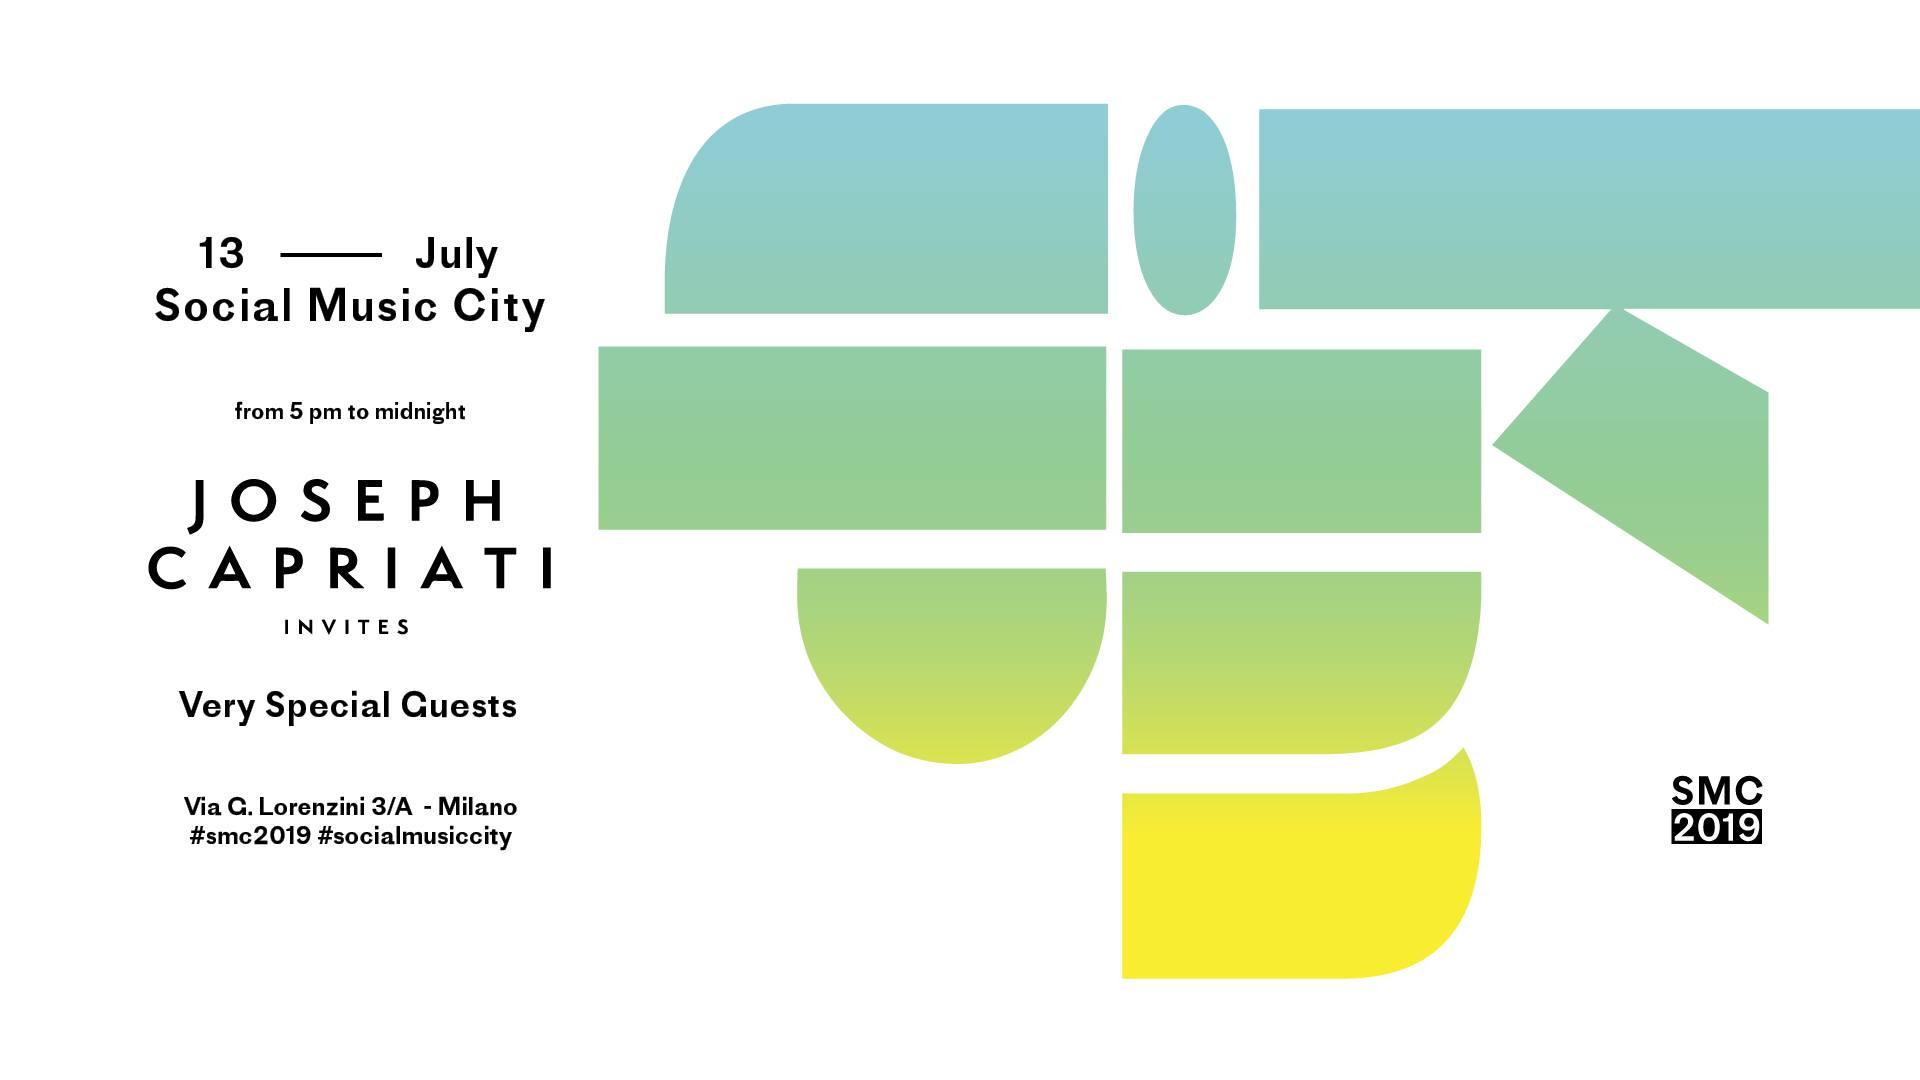 Joseph Capriati Invites Social Music City 12 Luglio 2019